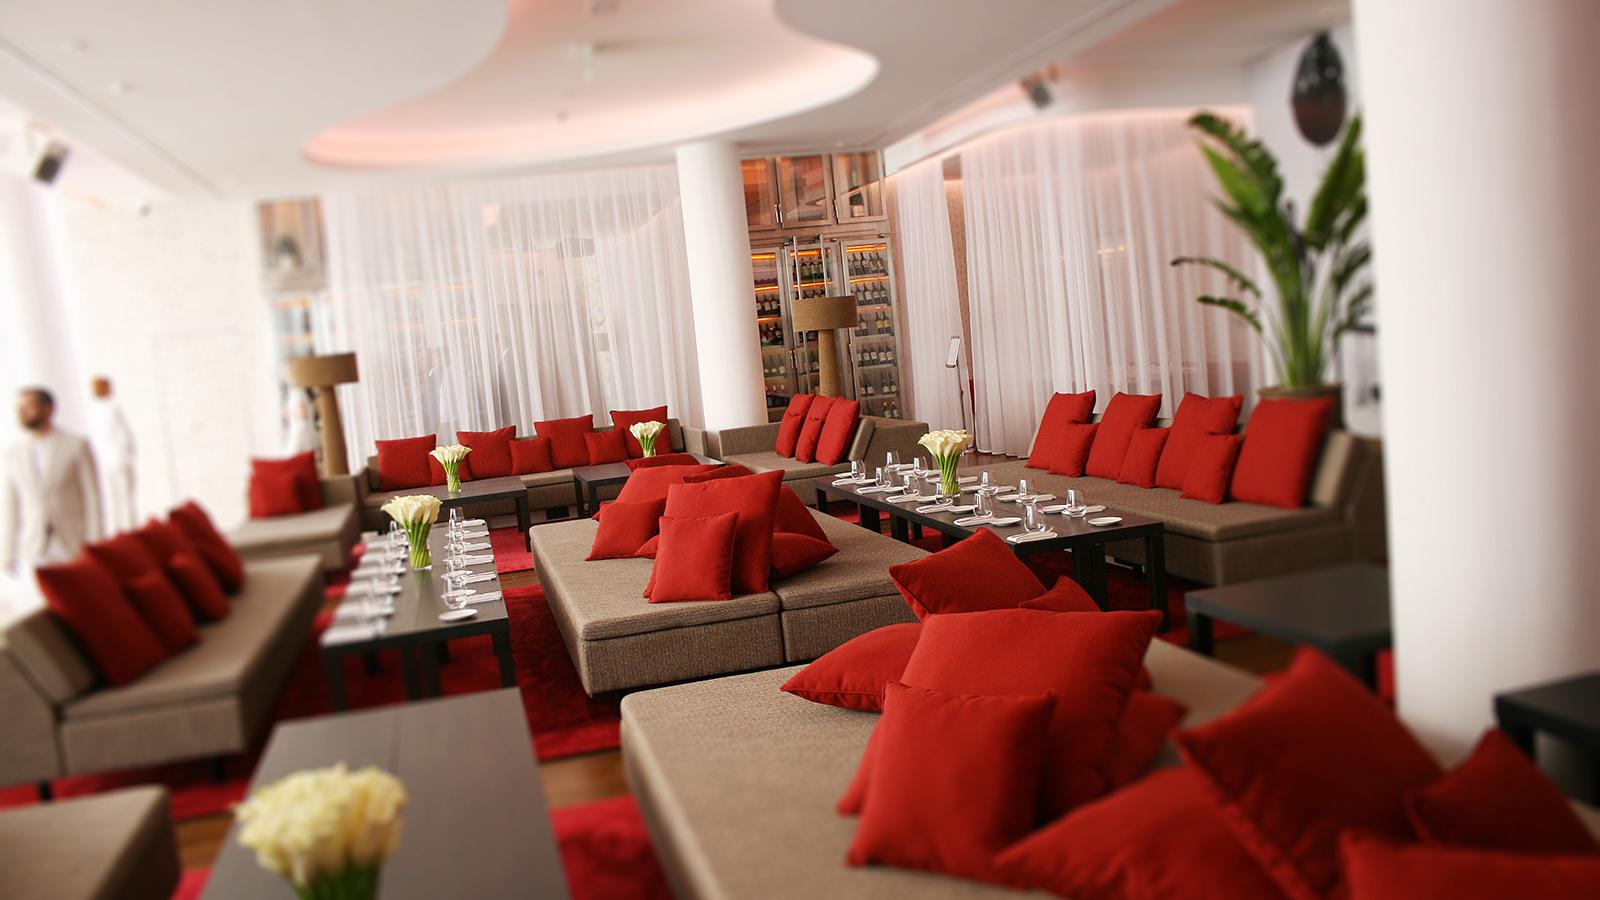 Dubai's 9 most luxurious restaurants | CNN Travel on